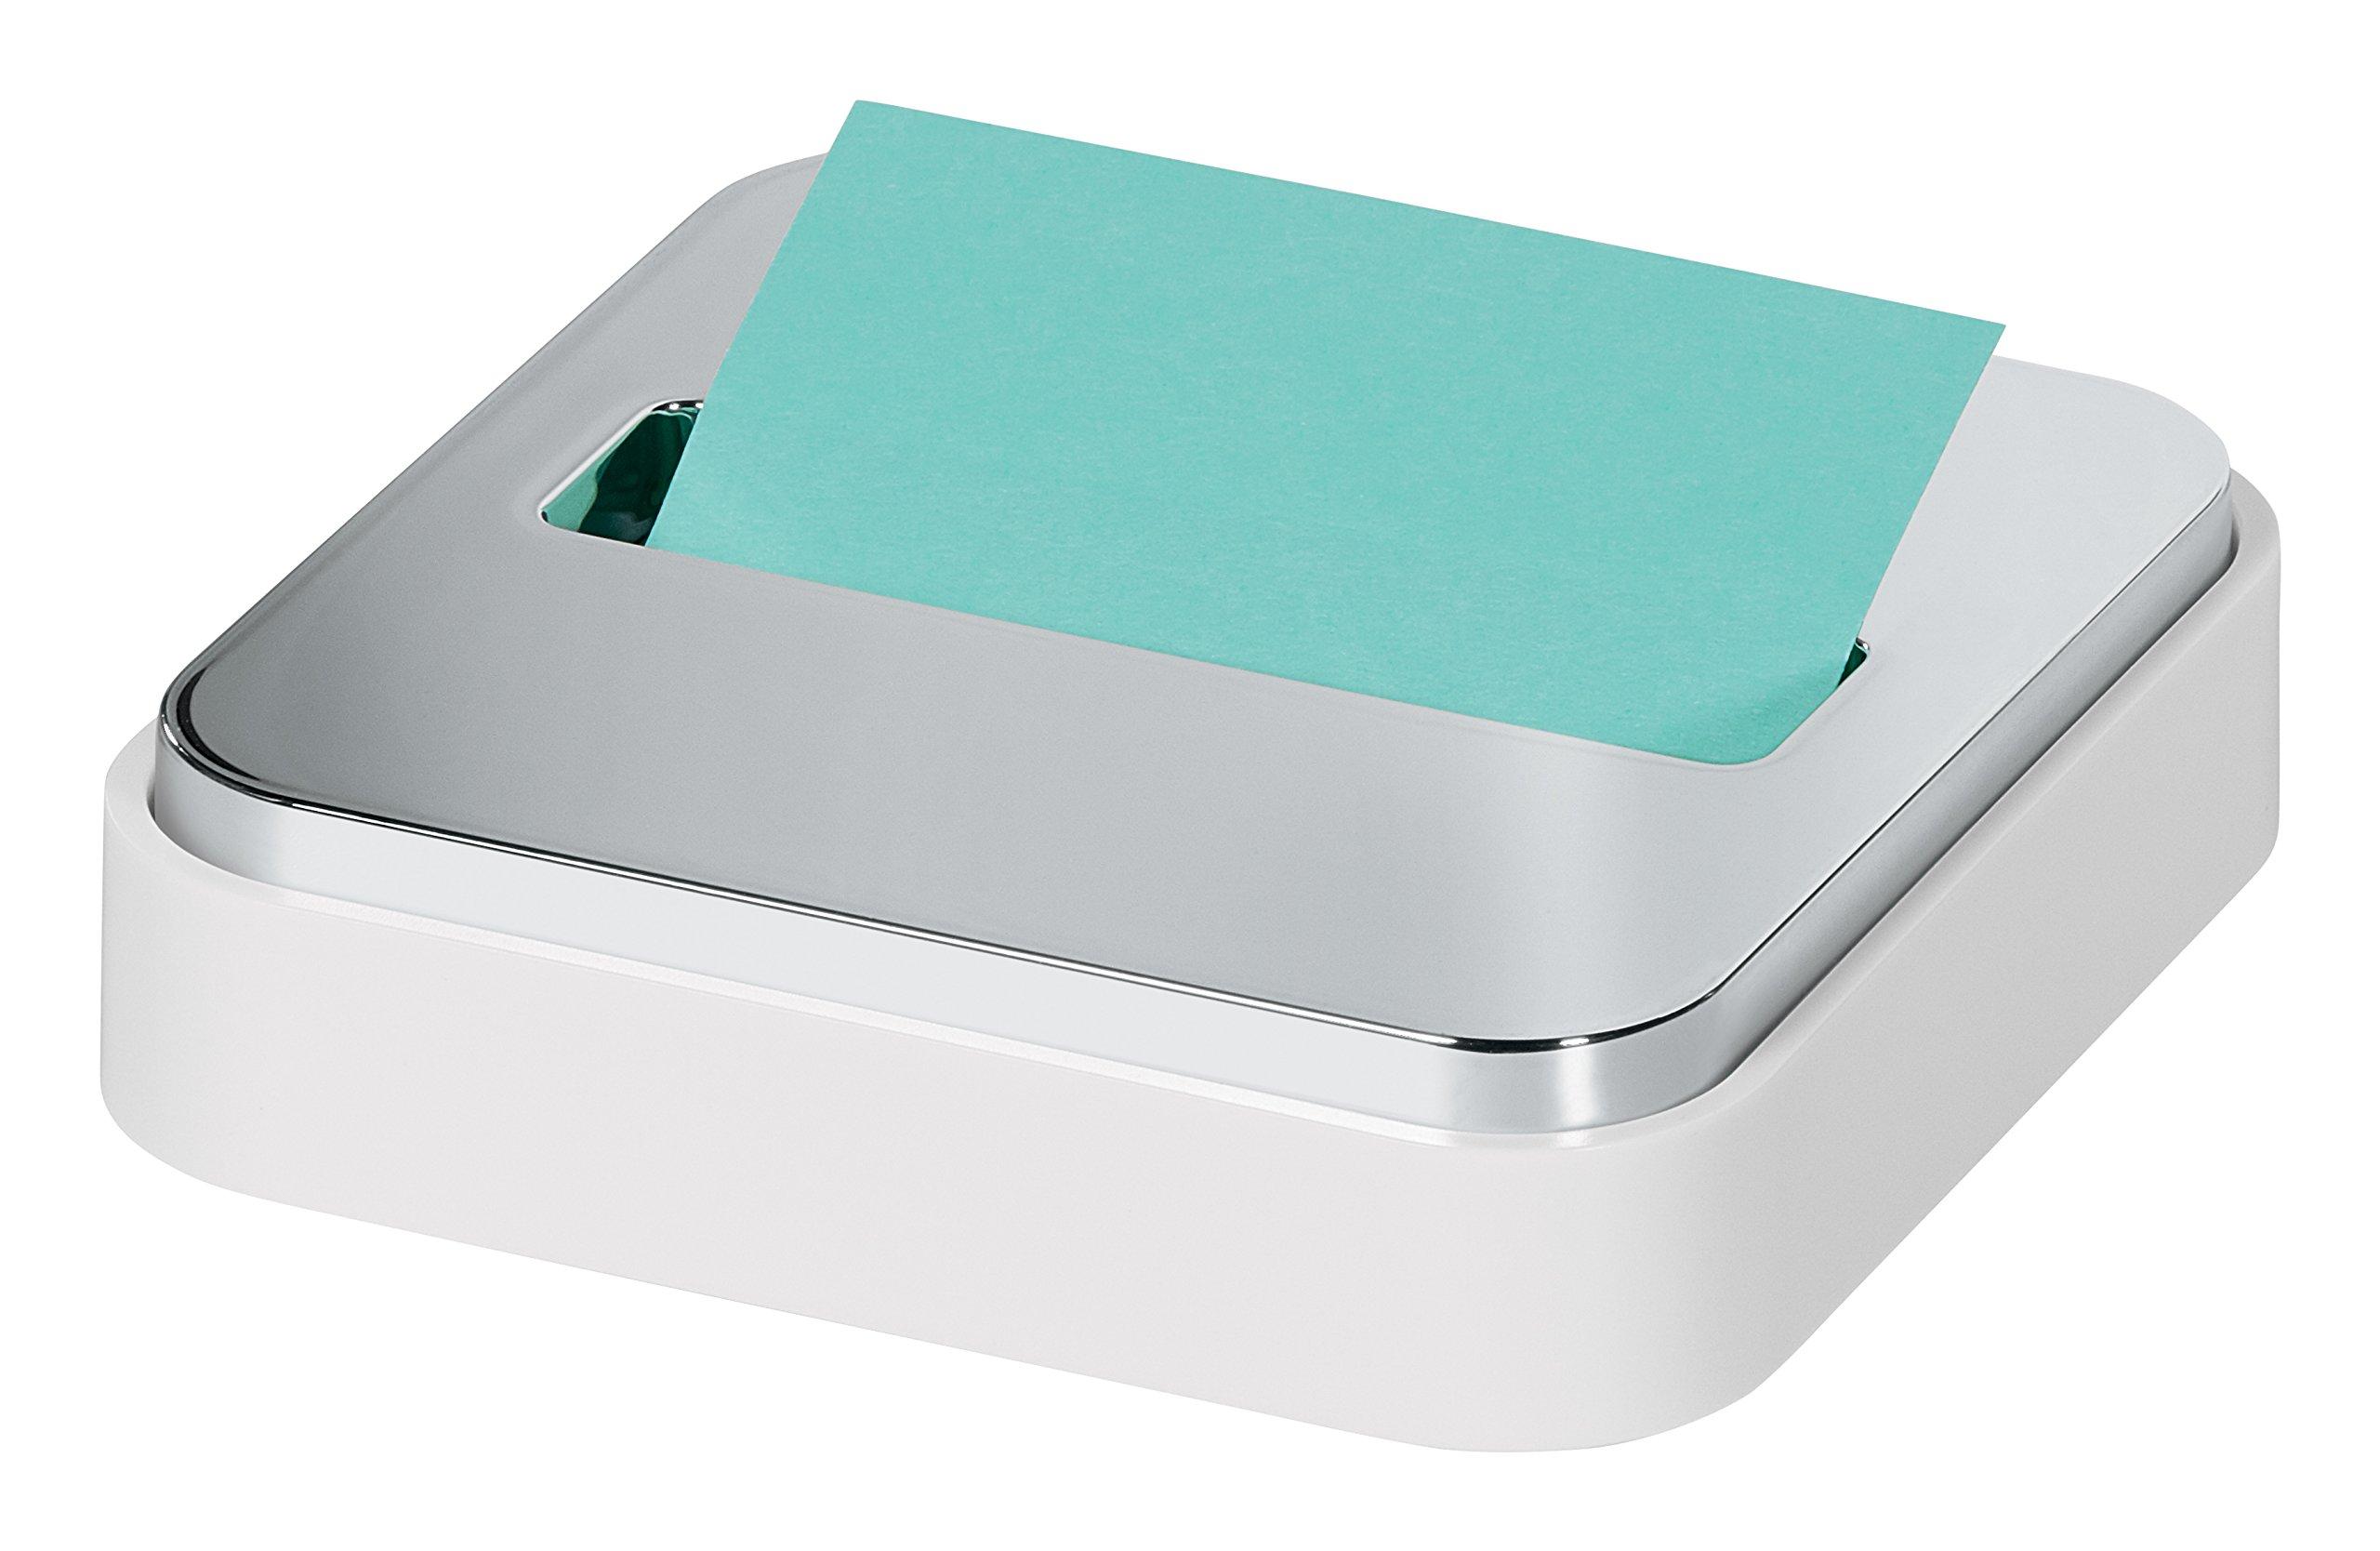 Post-it Dispenser Sticky Dispenser, White & Silver, Easy One Handed Dispensing (STL-330-W) by Post-it